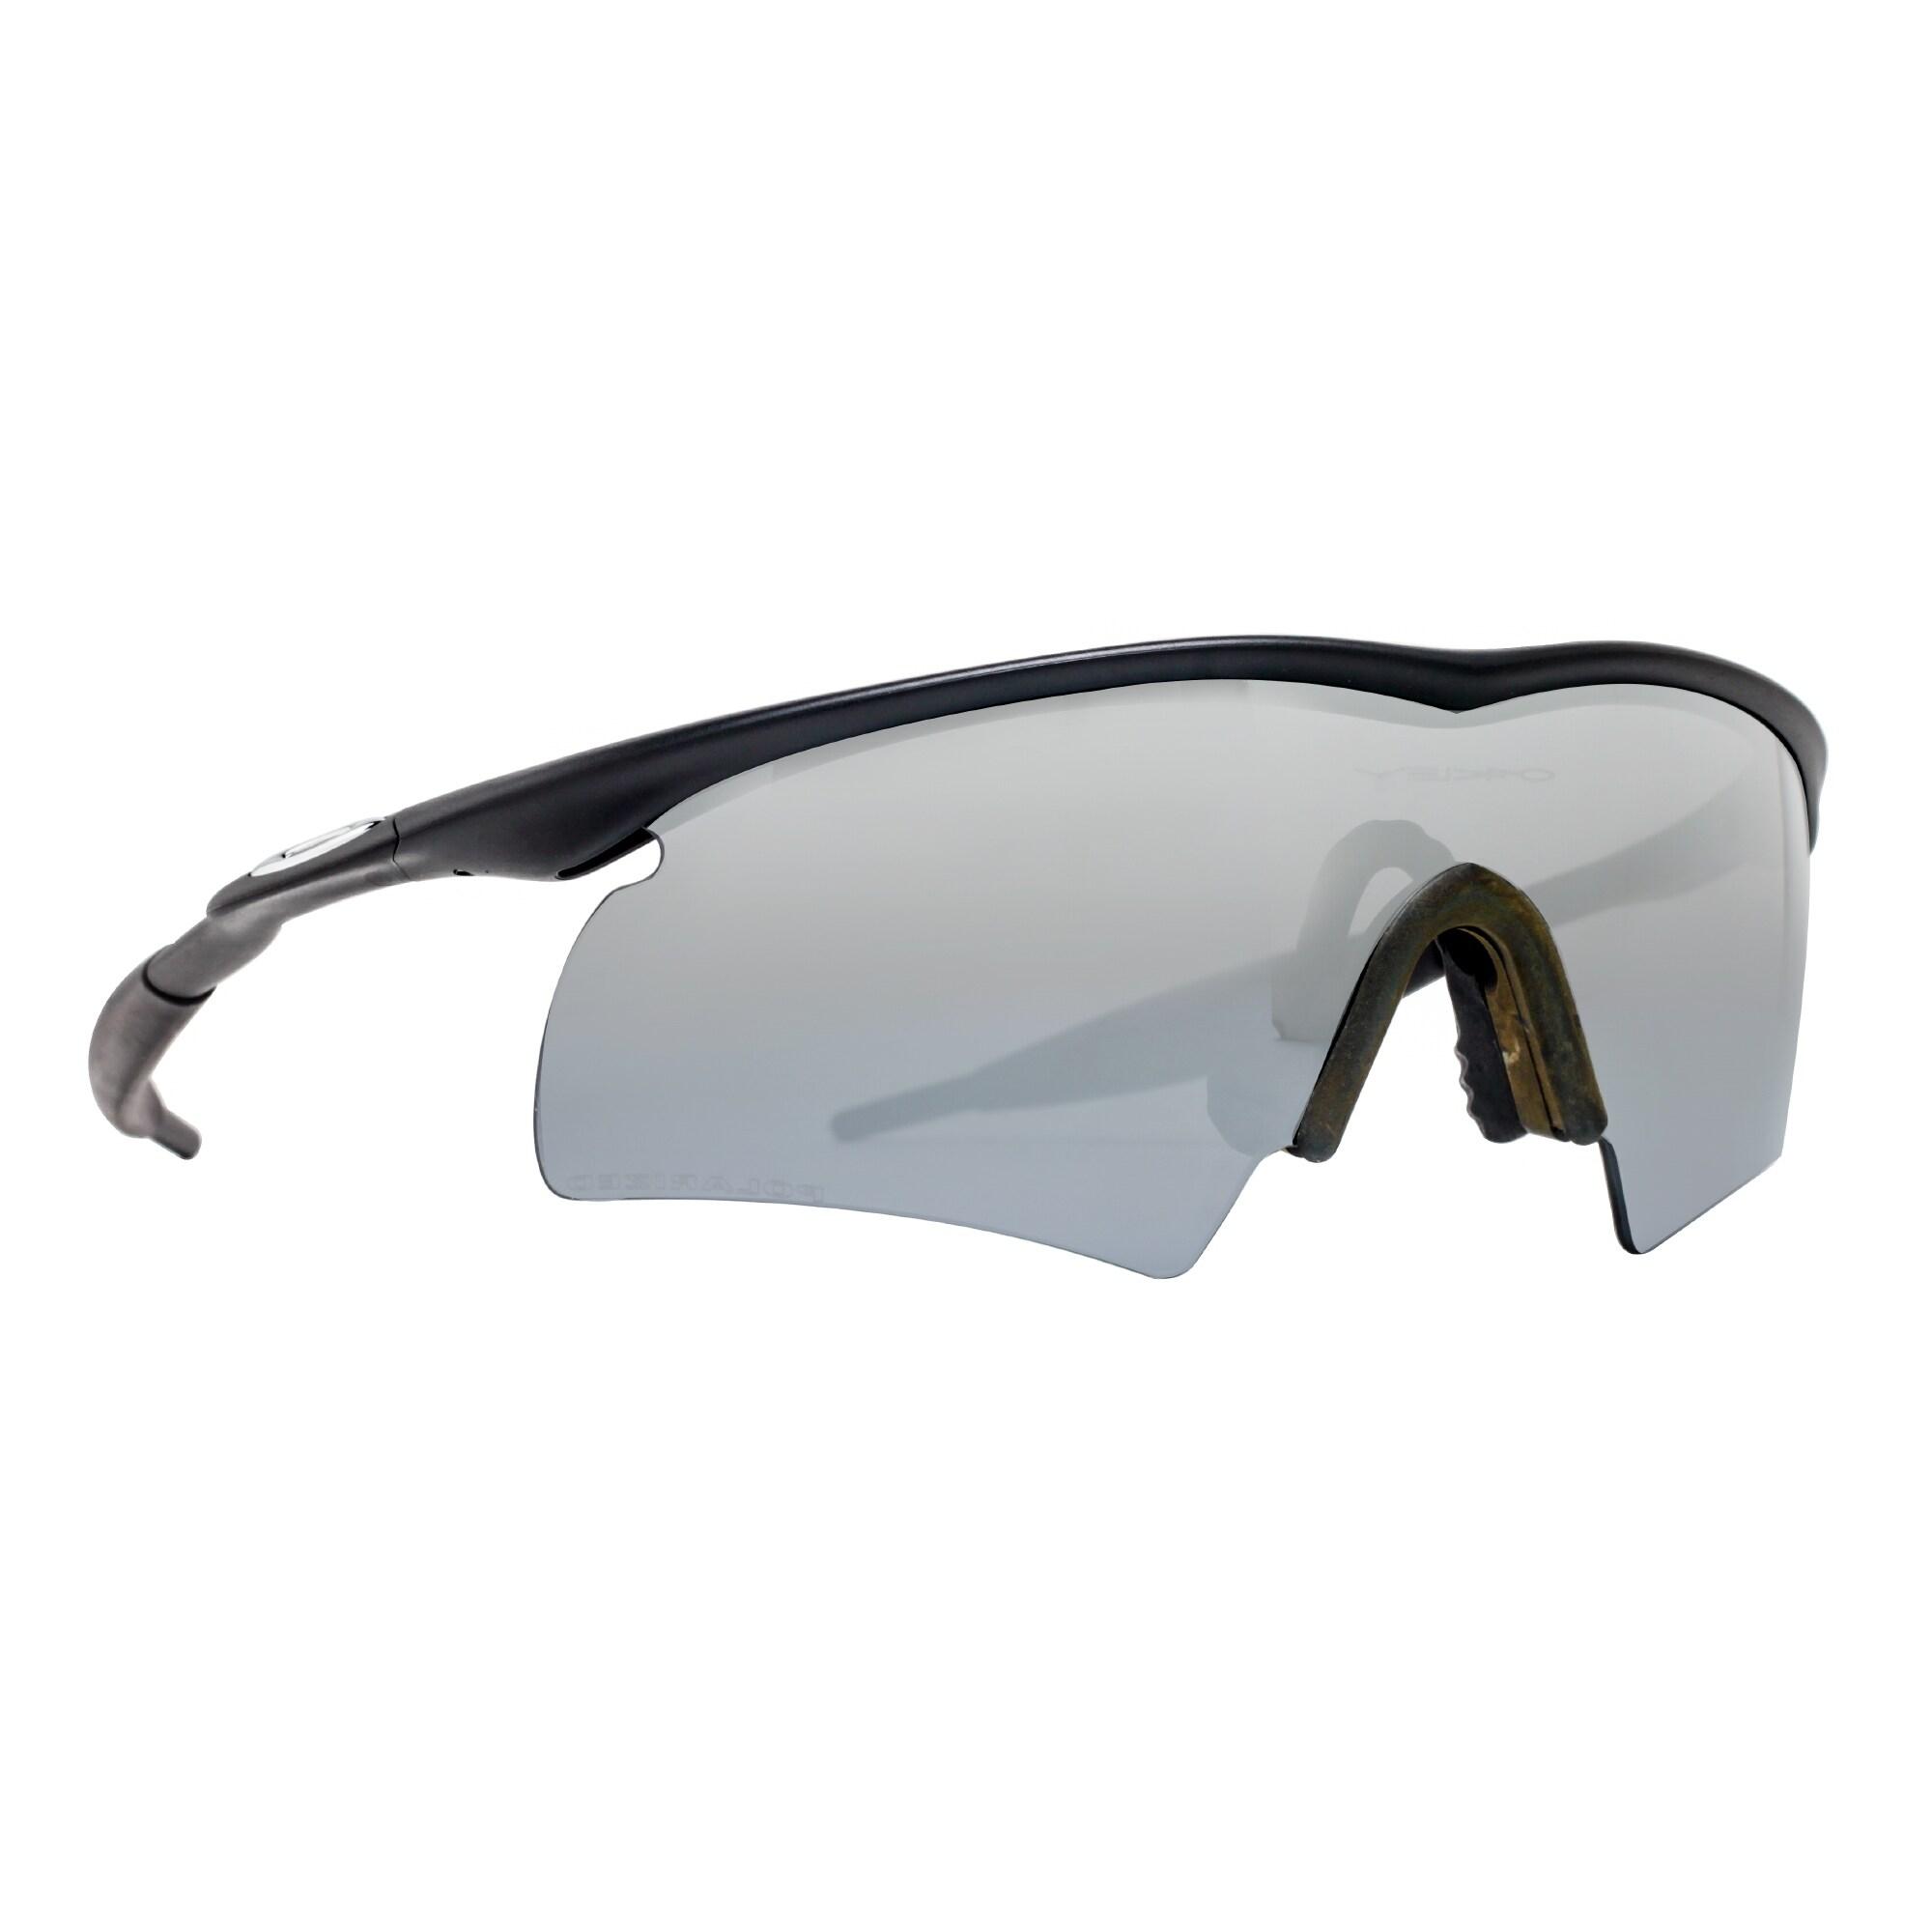 cheap oakley m frame hybrid sunglasses jack